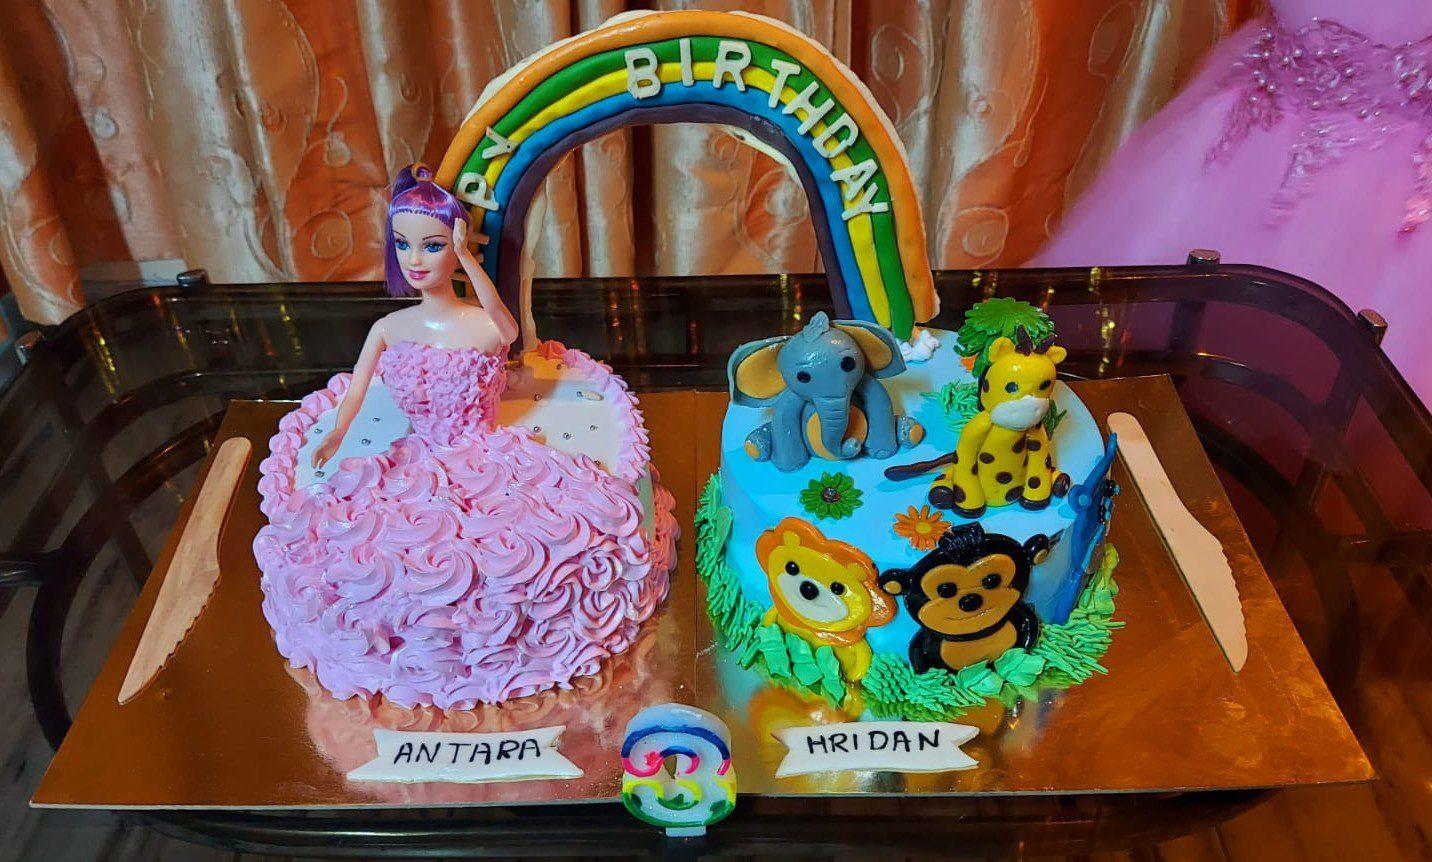 Animal Theme Fondant Cake and Doll Cake Designs, Images, Price Near Me